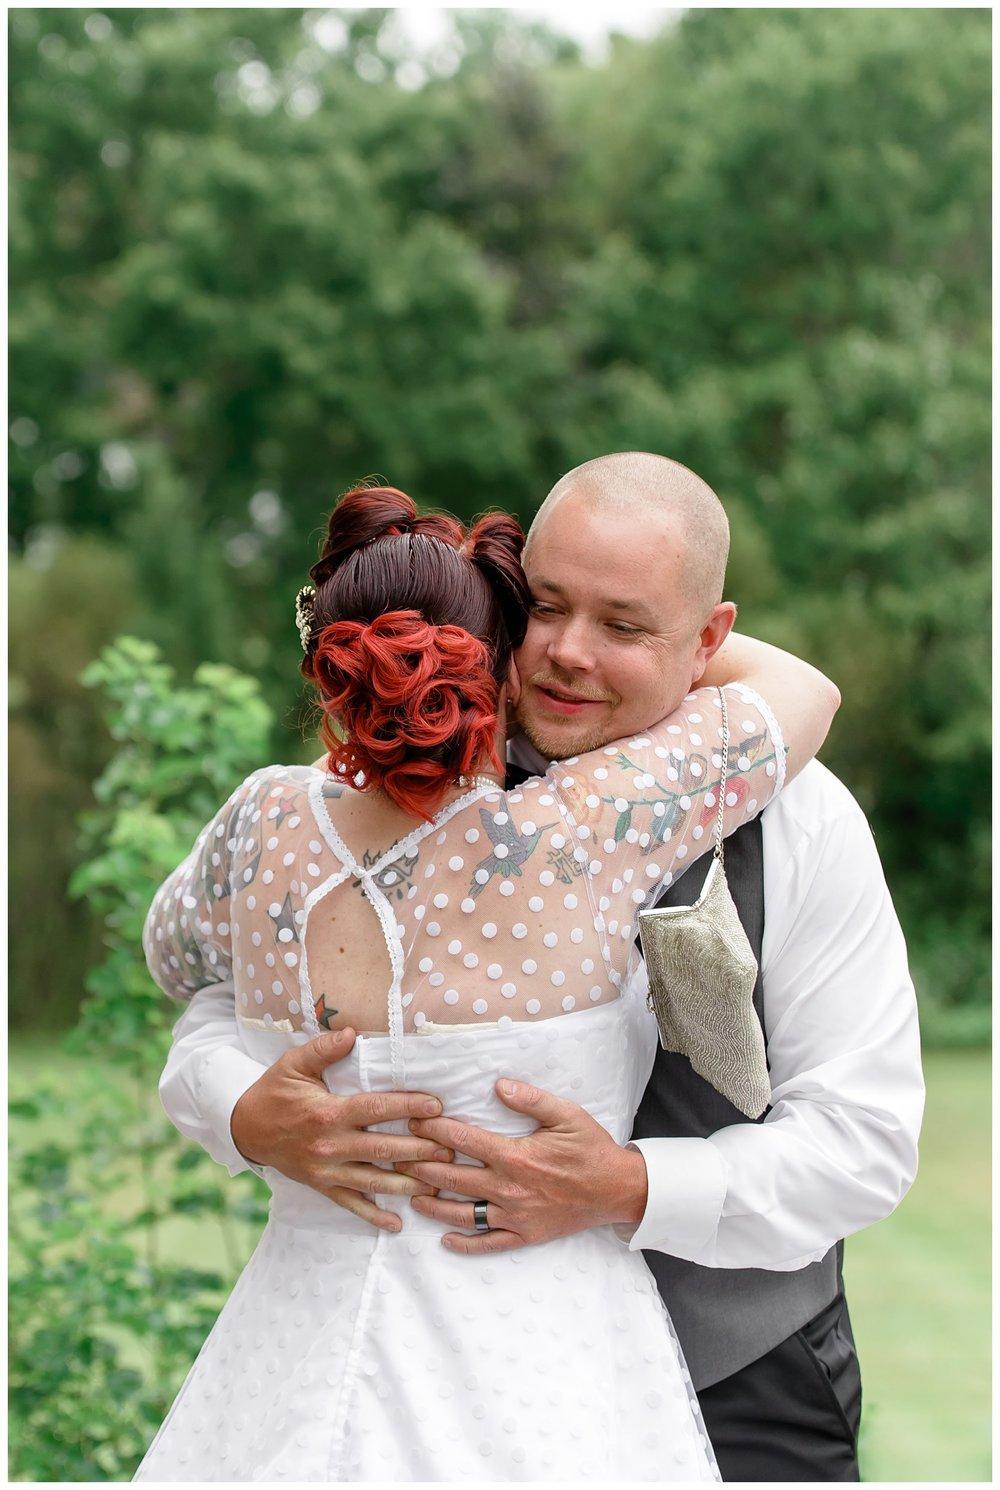 Charleston-South-Carolina-Wedding-Photographer-Engagement-Photography-green-eco-friendly-stephanie-kopf-photography-12.jpg